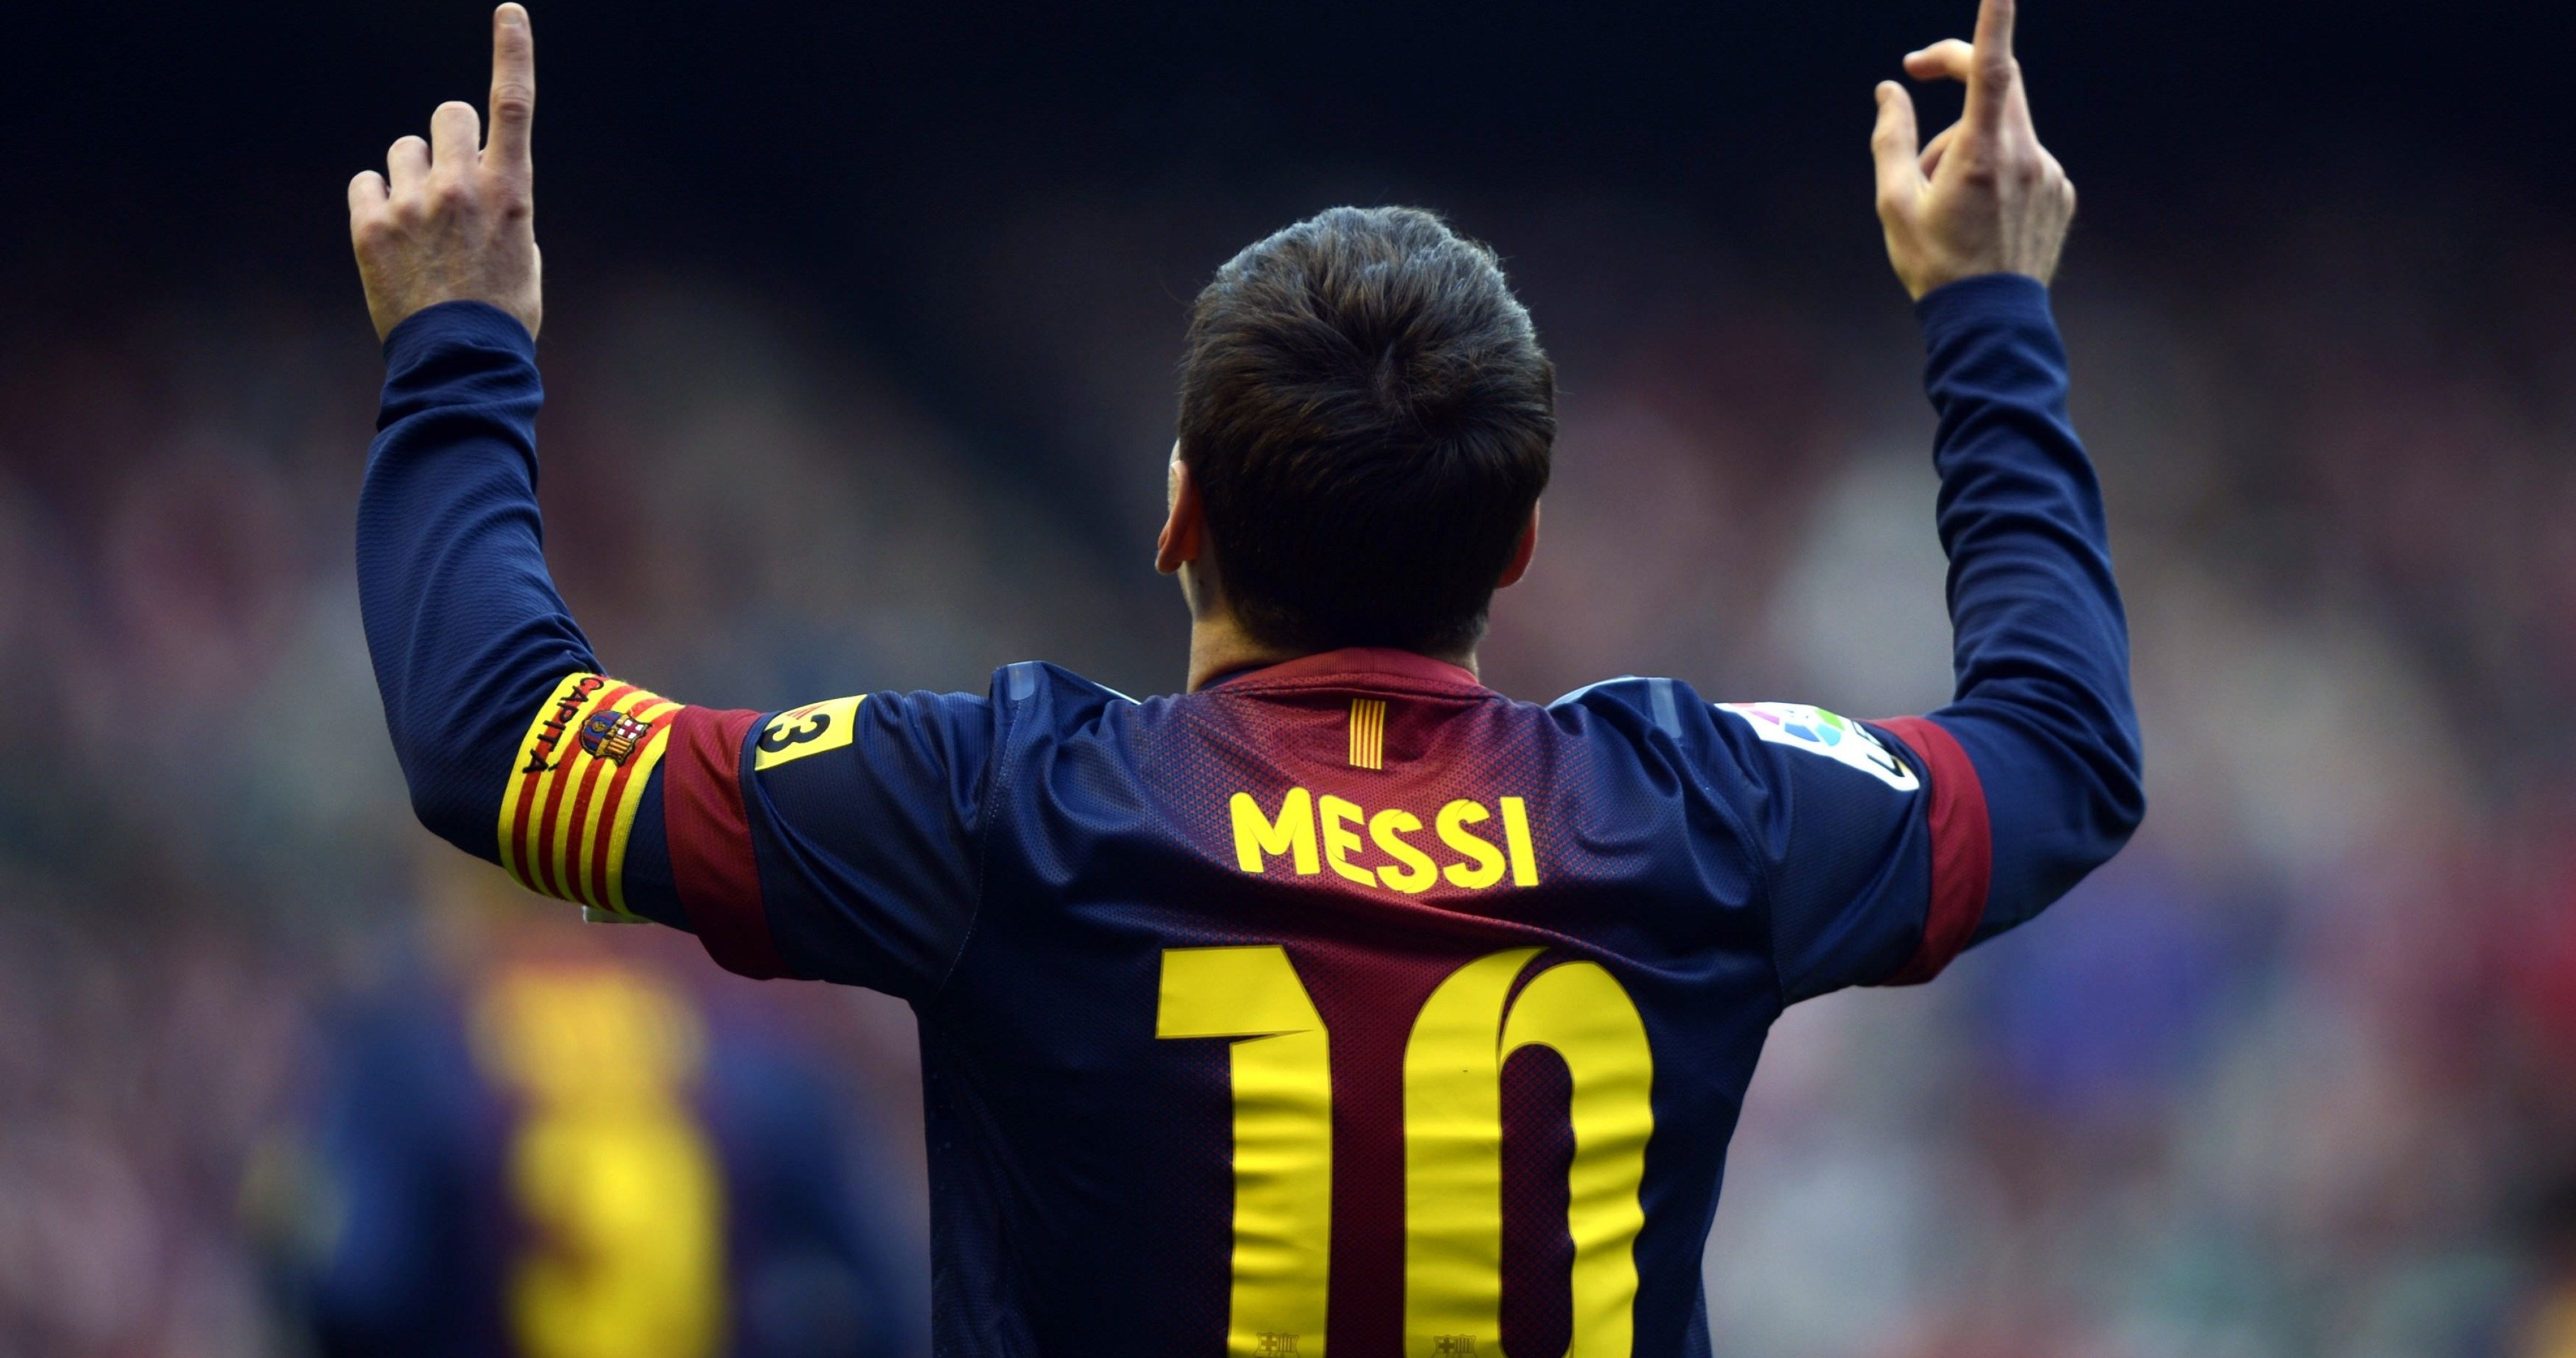 Messi Barcelona 10 4k Ultra Hd Wallpaper Lionel Messi Messi Player Messi